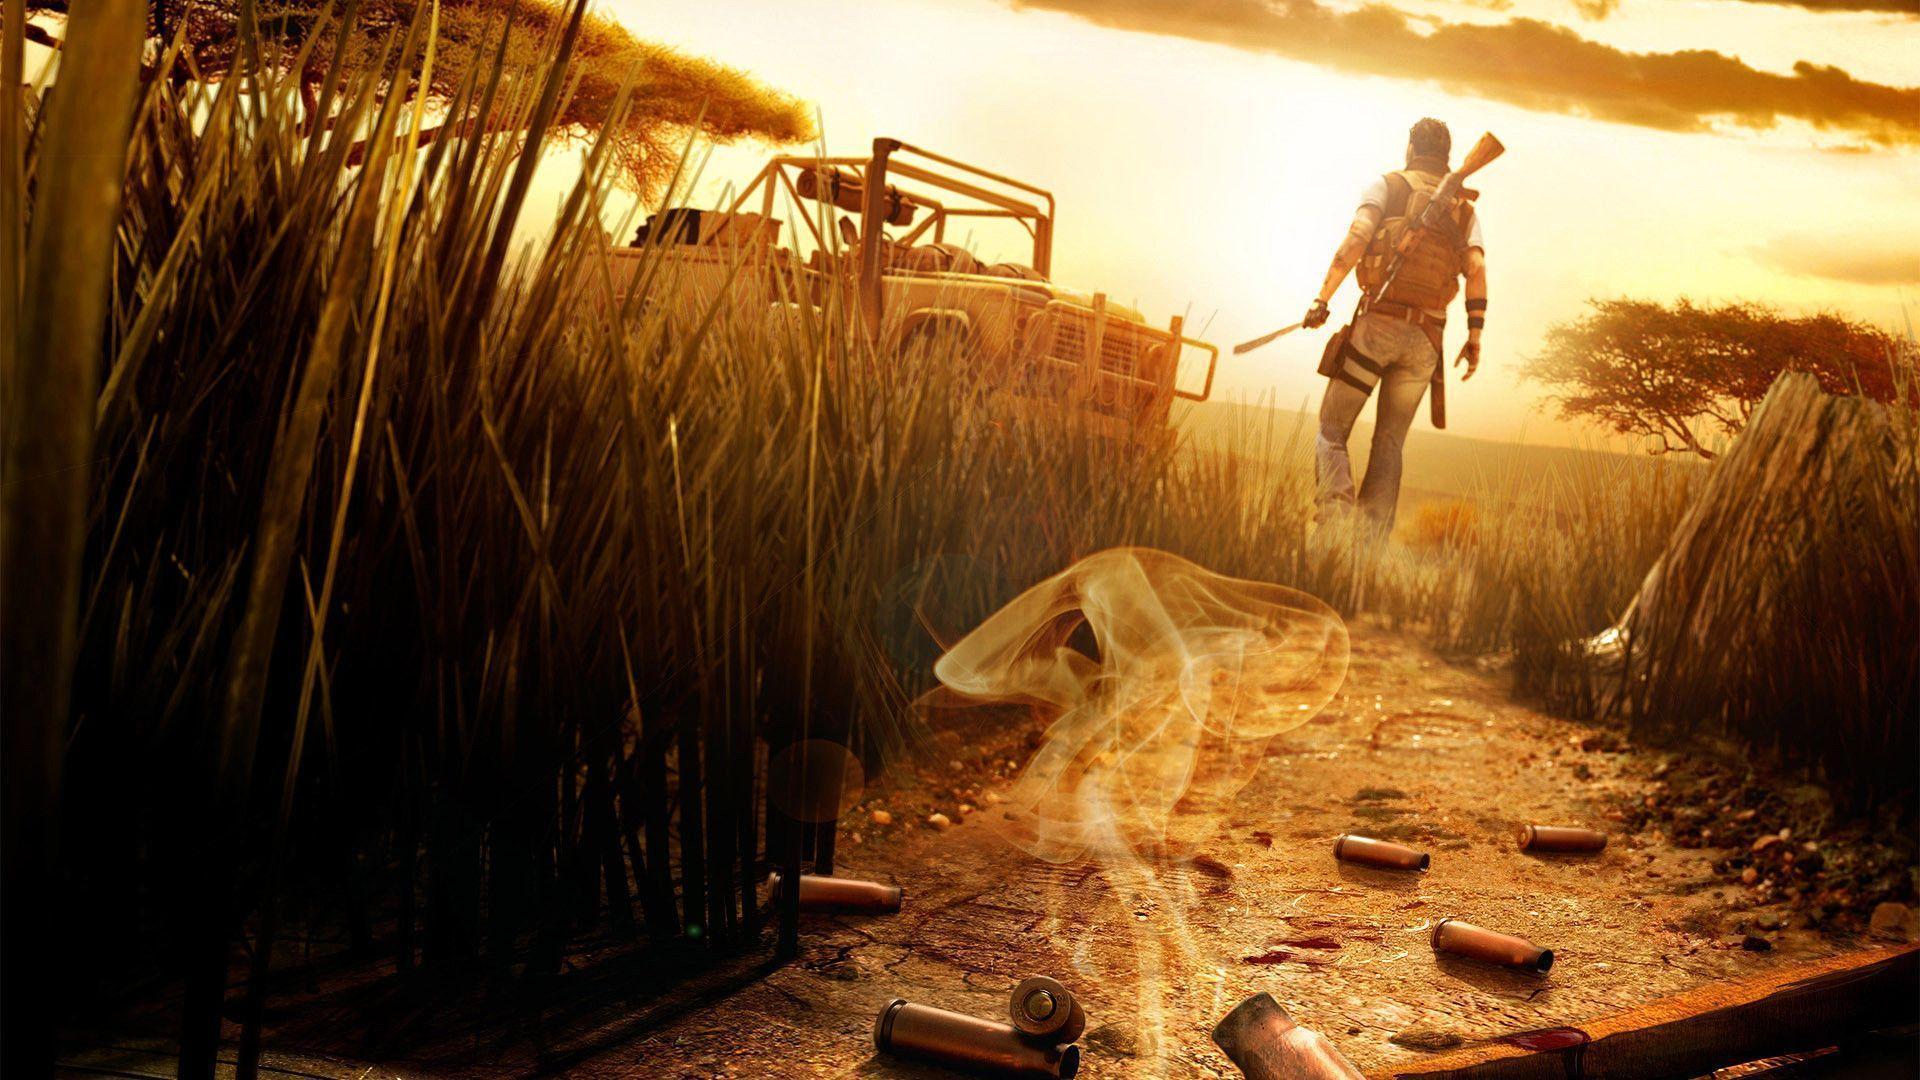 wBaEw8P.jpg - Far Cry 2